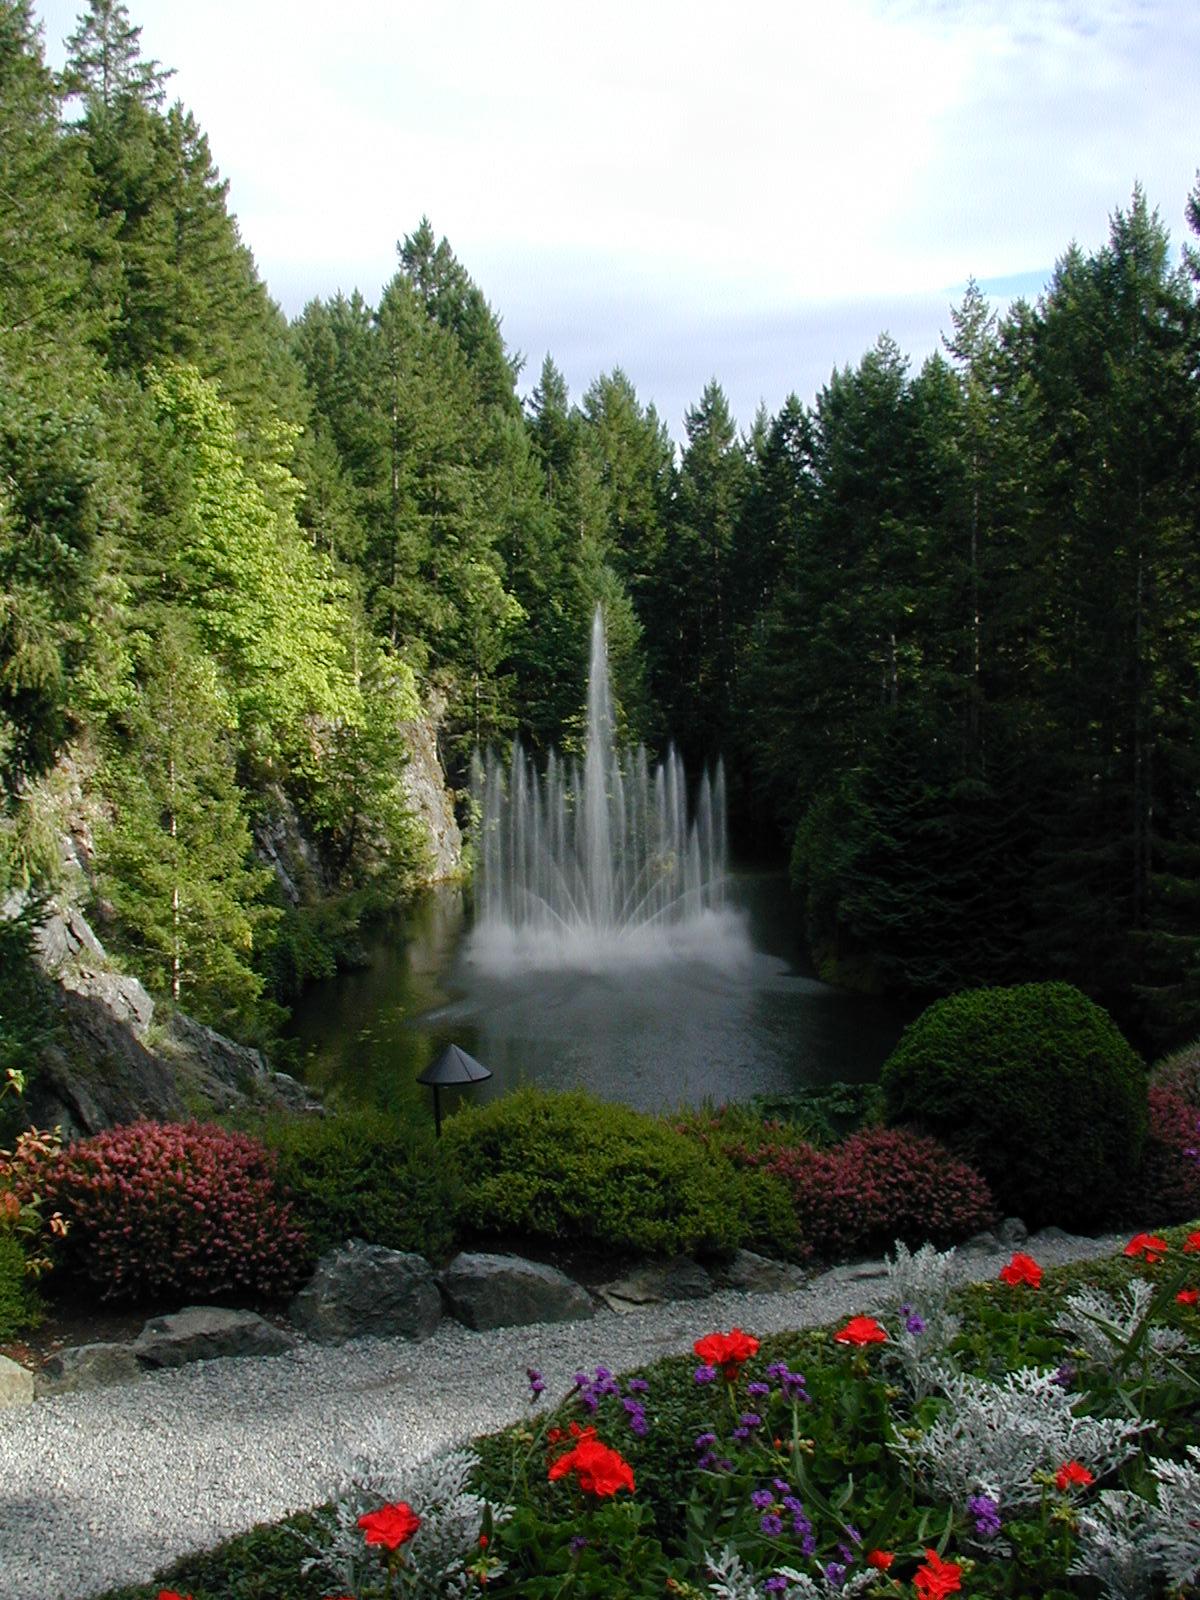 Water Fountains at Butchart